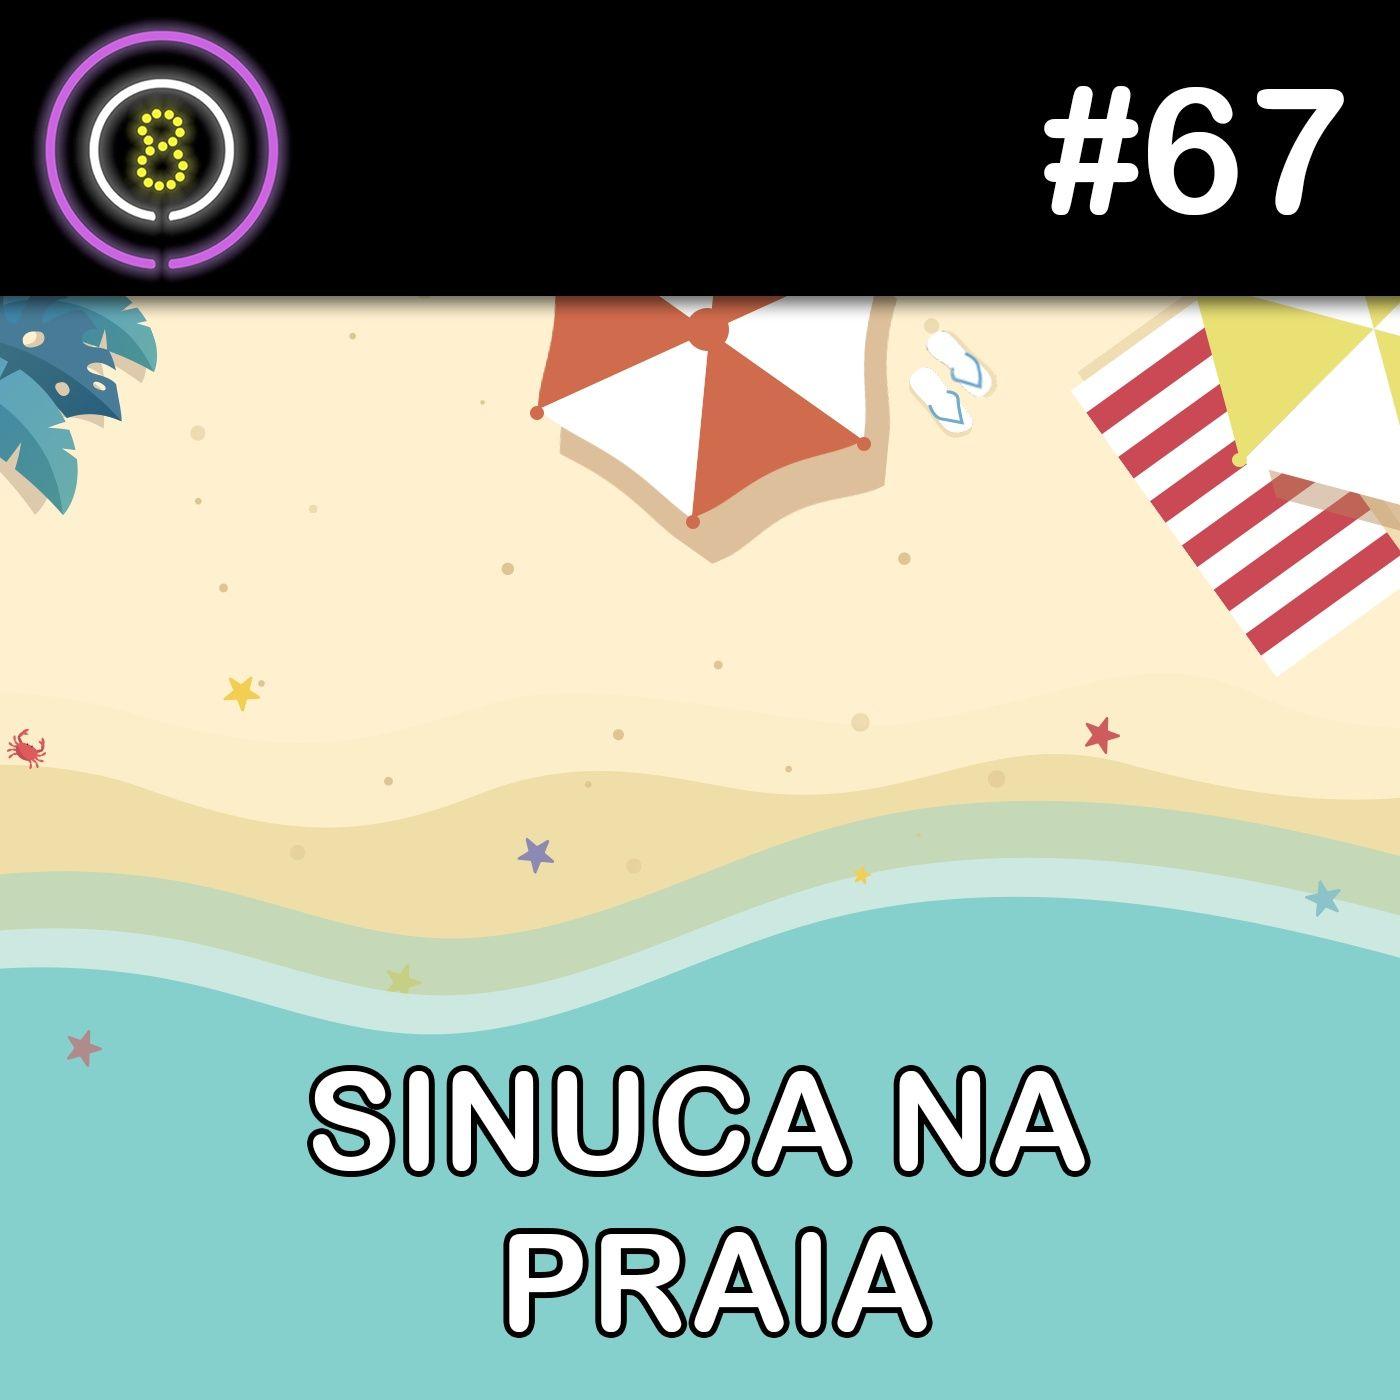 #67 - Sinuca na Praia